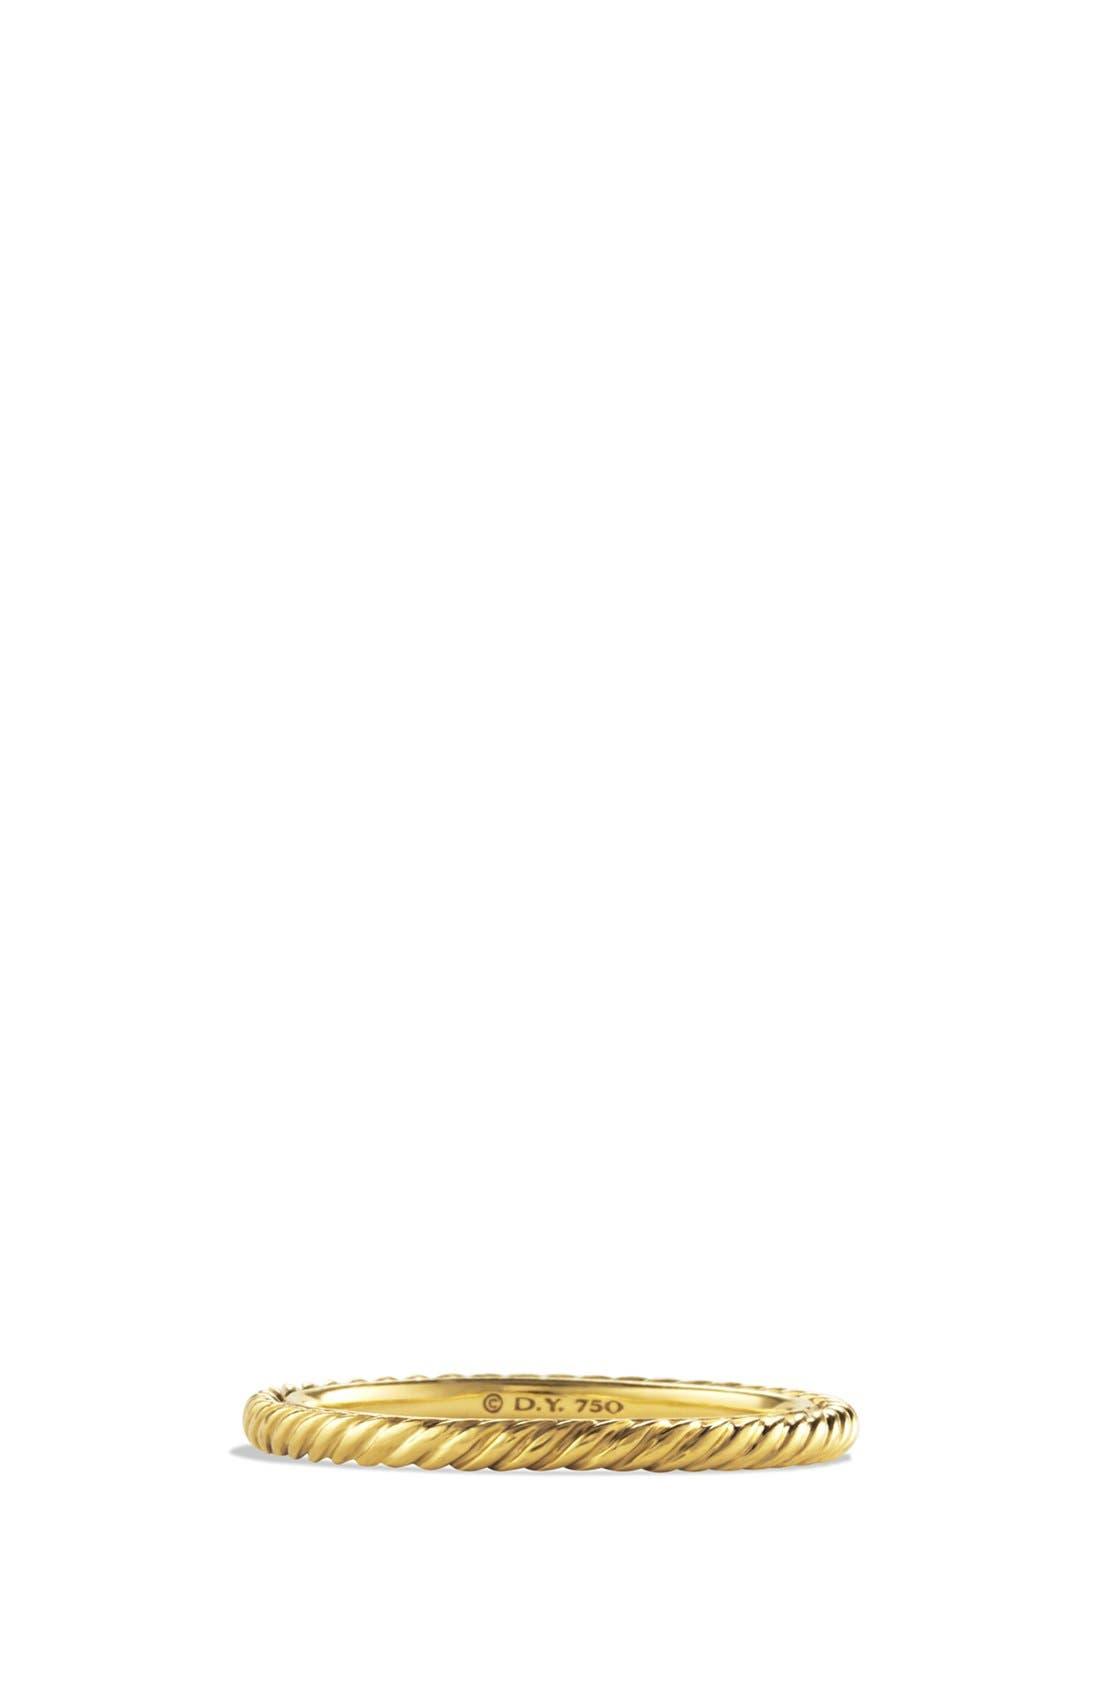 David Yurman 'Cable' Band Ring in Gold